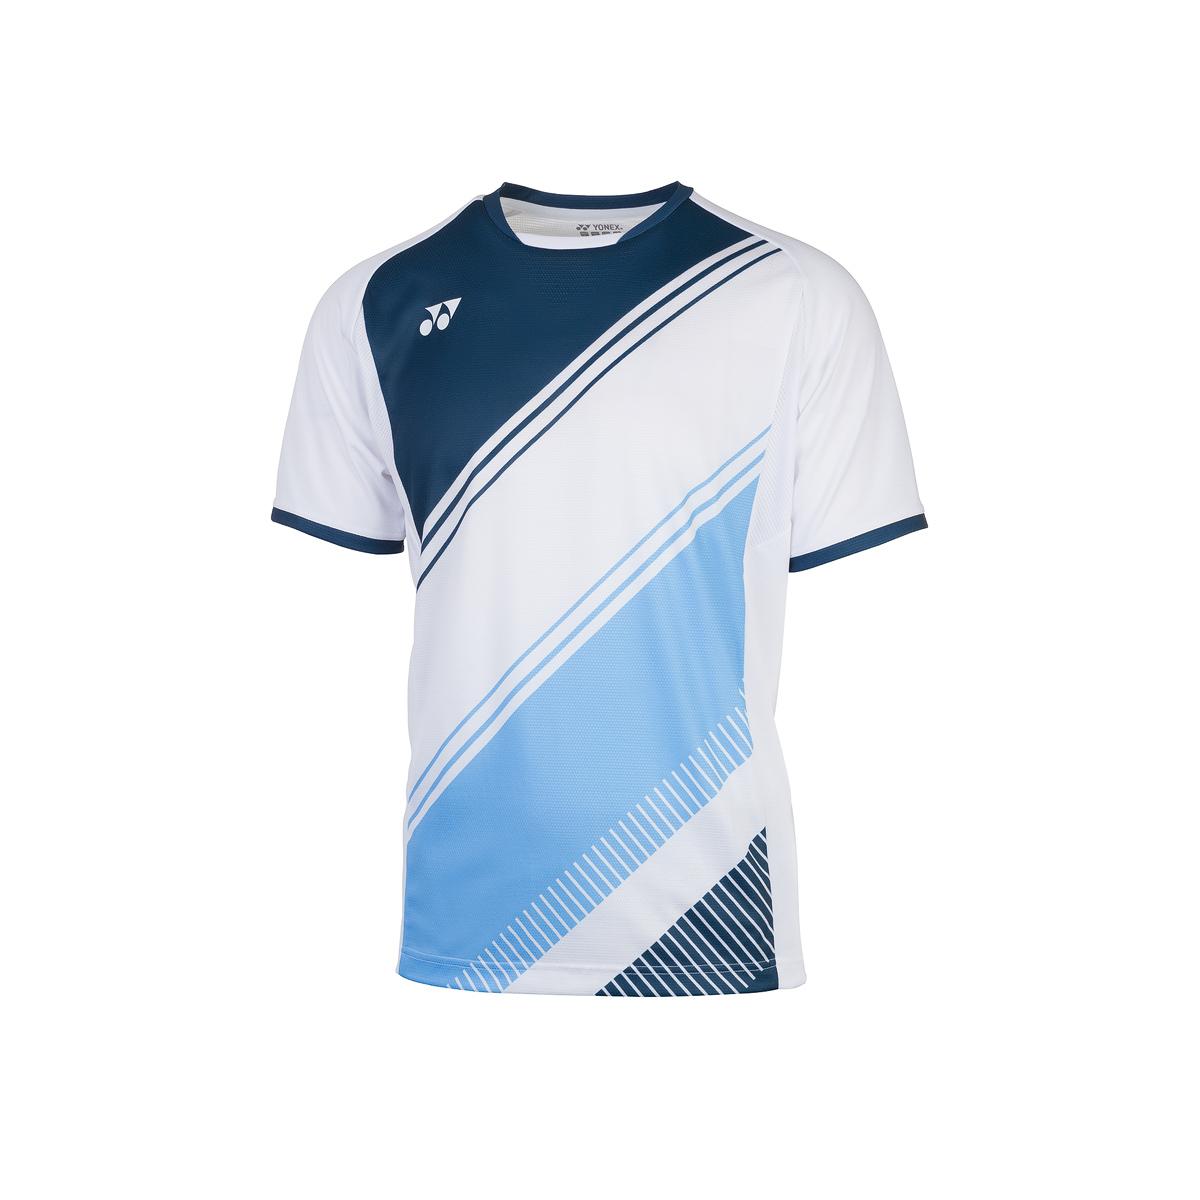 Men's Crew Neck Shirt Badminton TournamentDetailbild - 2